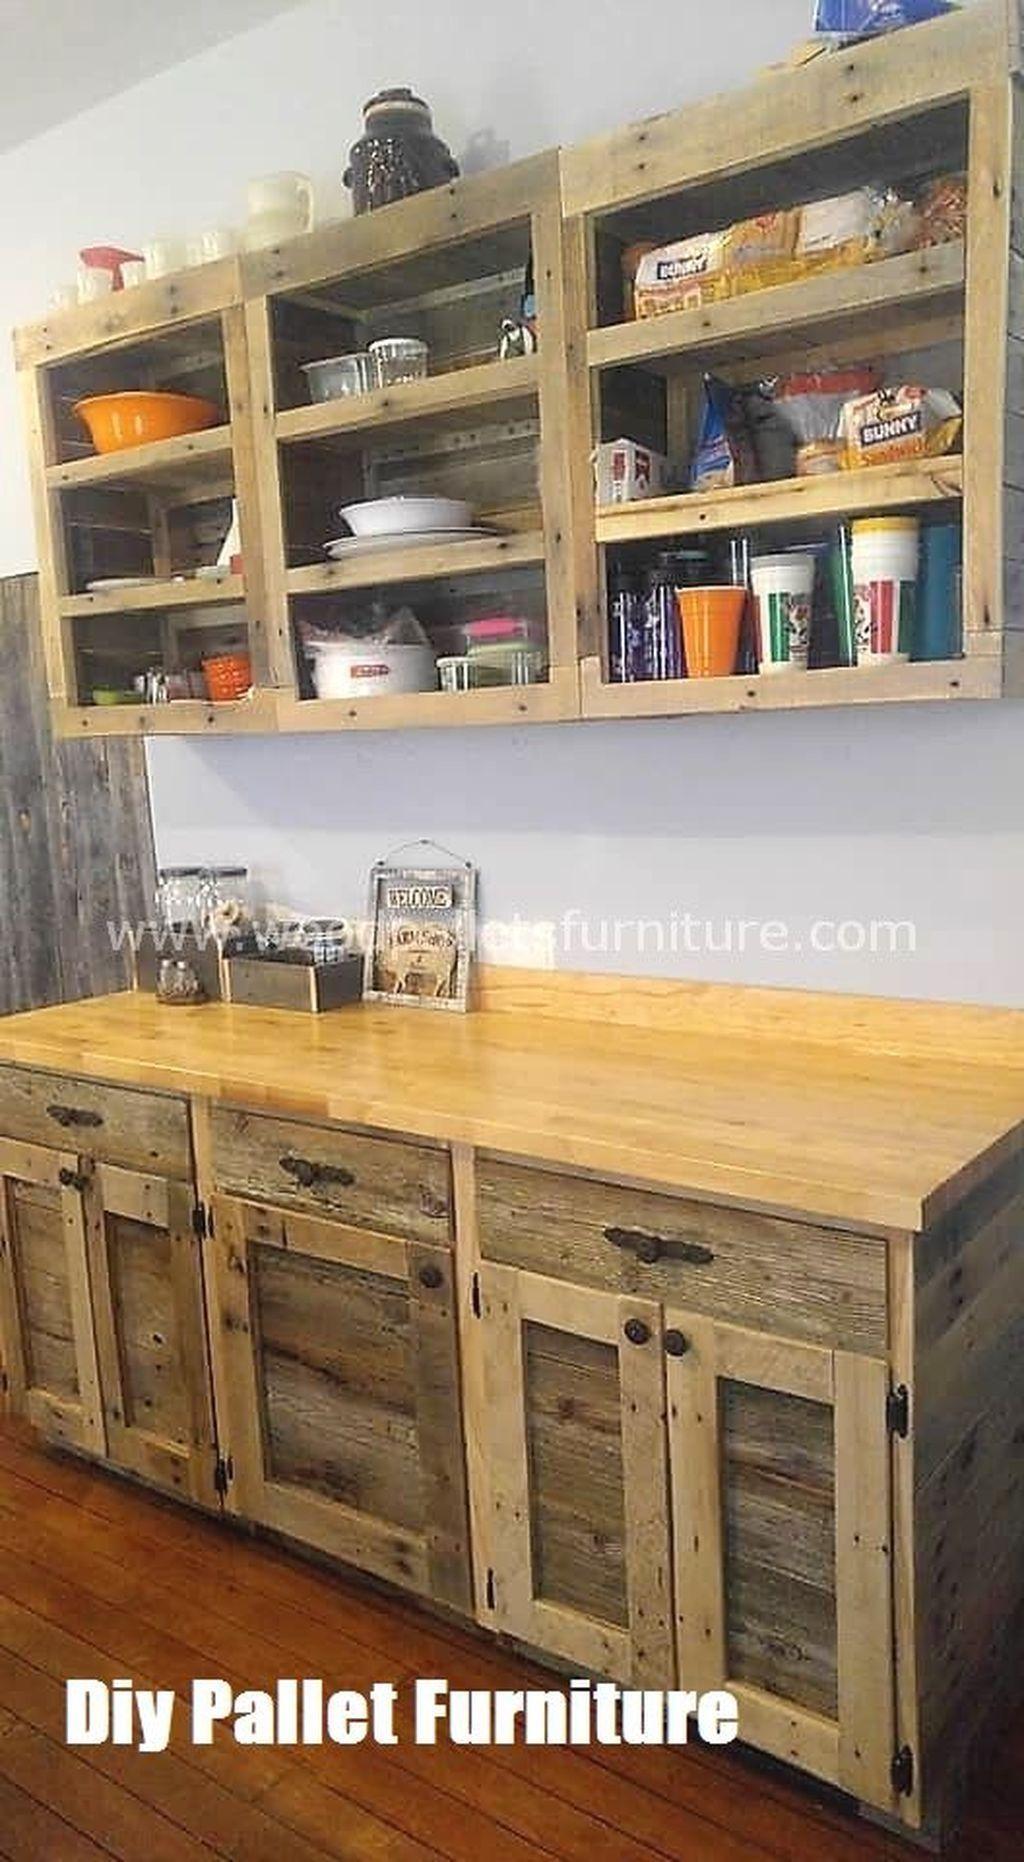 Diy Pallet Furniture Pallet Kitchen Cabinets Pallet Kitchen Pallet Projects Furniture P In 2020 Diy Pallet Furniture Pallet Kitchen Cabinets Pallet Kitchen